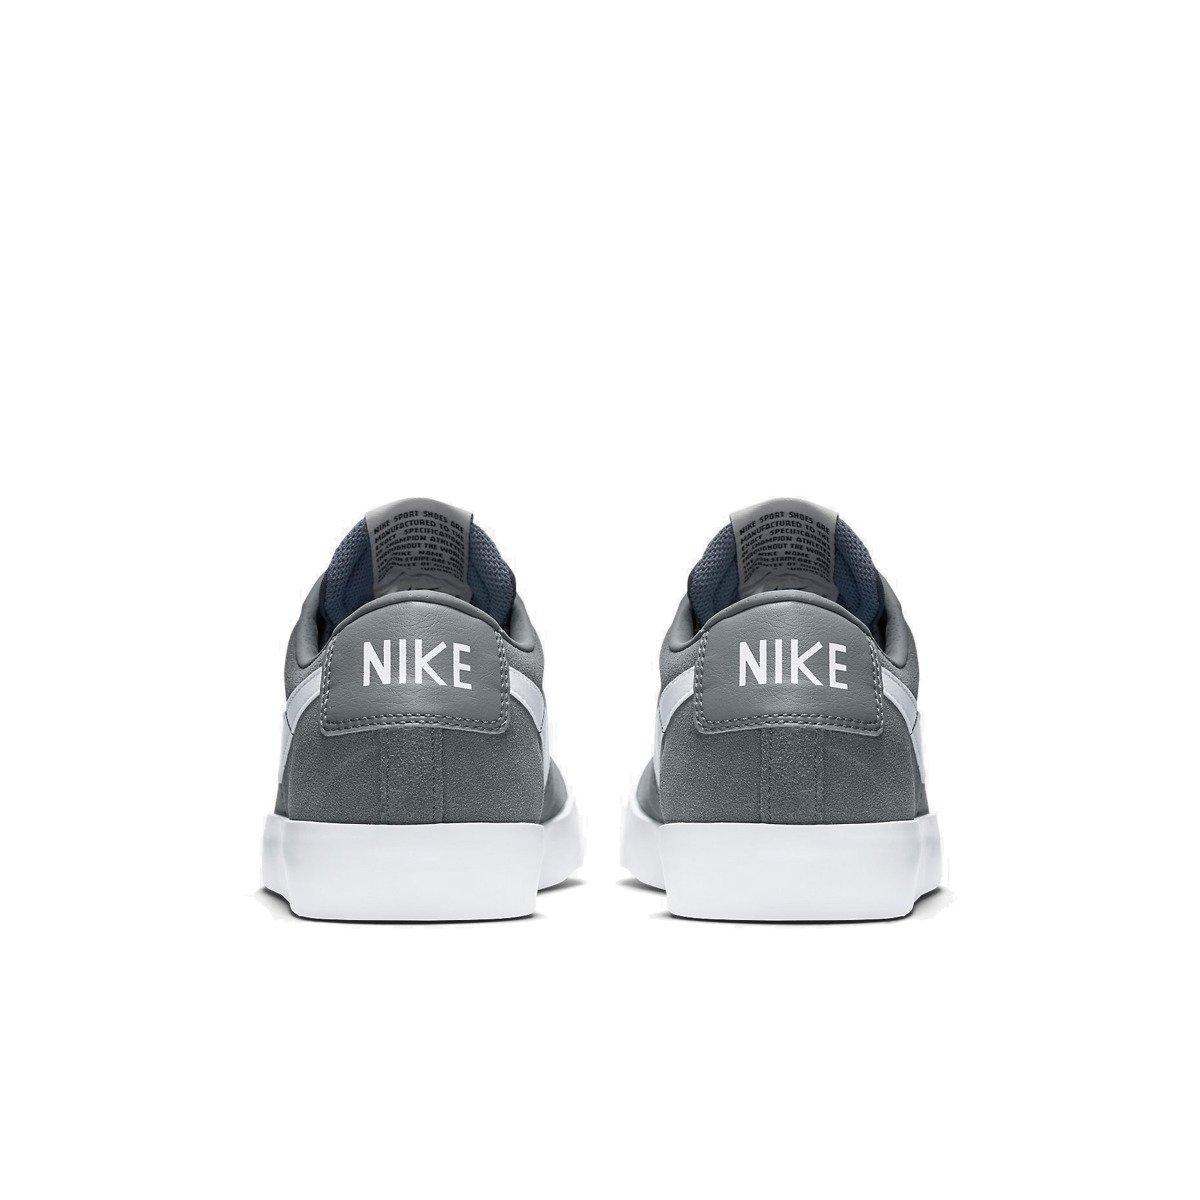 a5a9d29eea8 ... Buty Nike SB Blazer Low GT COOL GREY WHITE-TIDE POOL BLUE Click to zoom